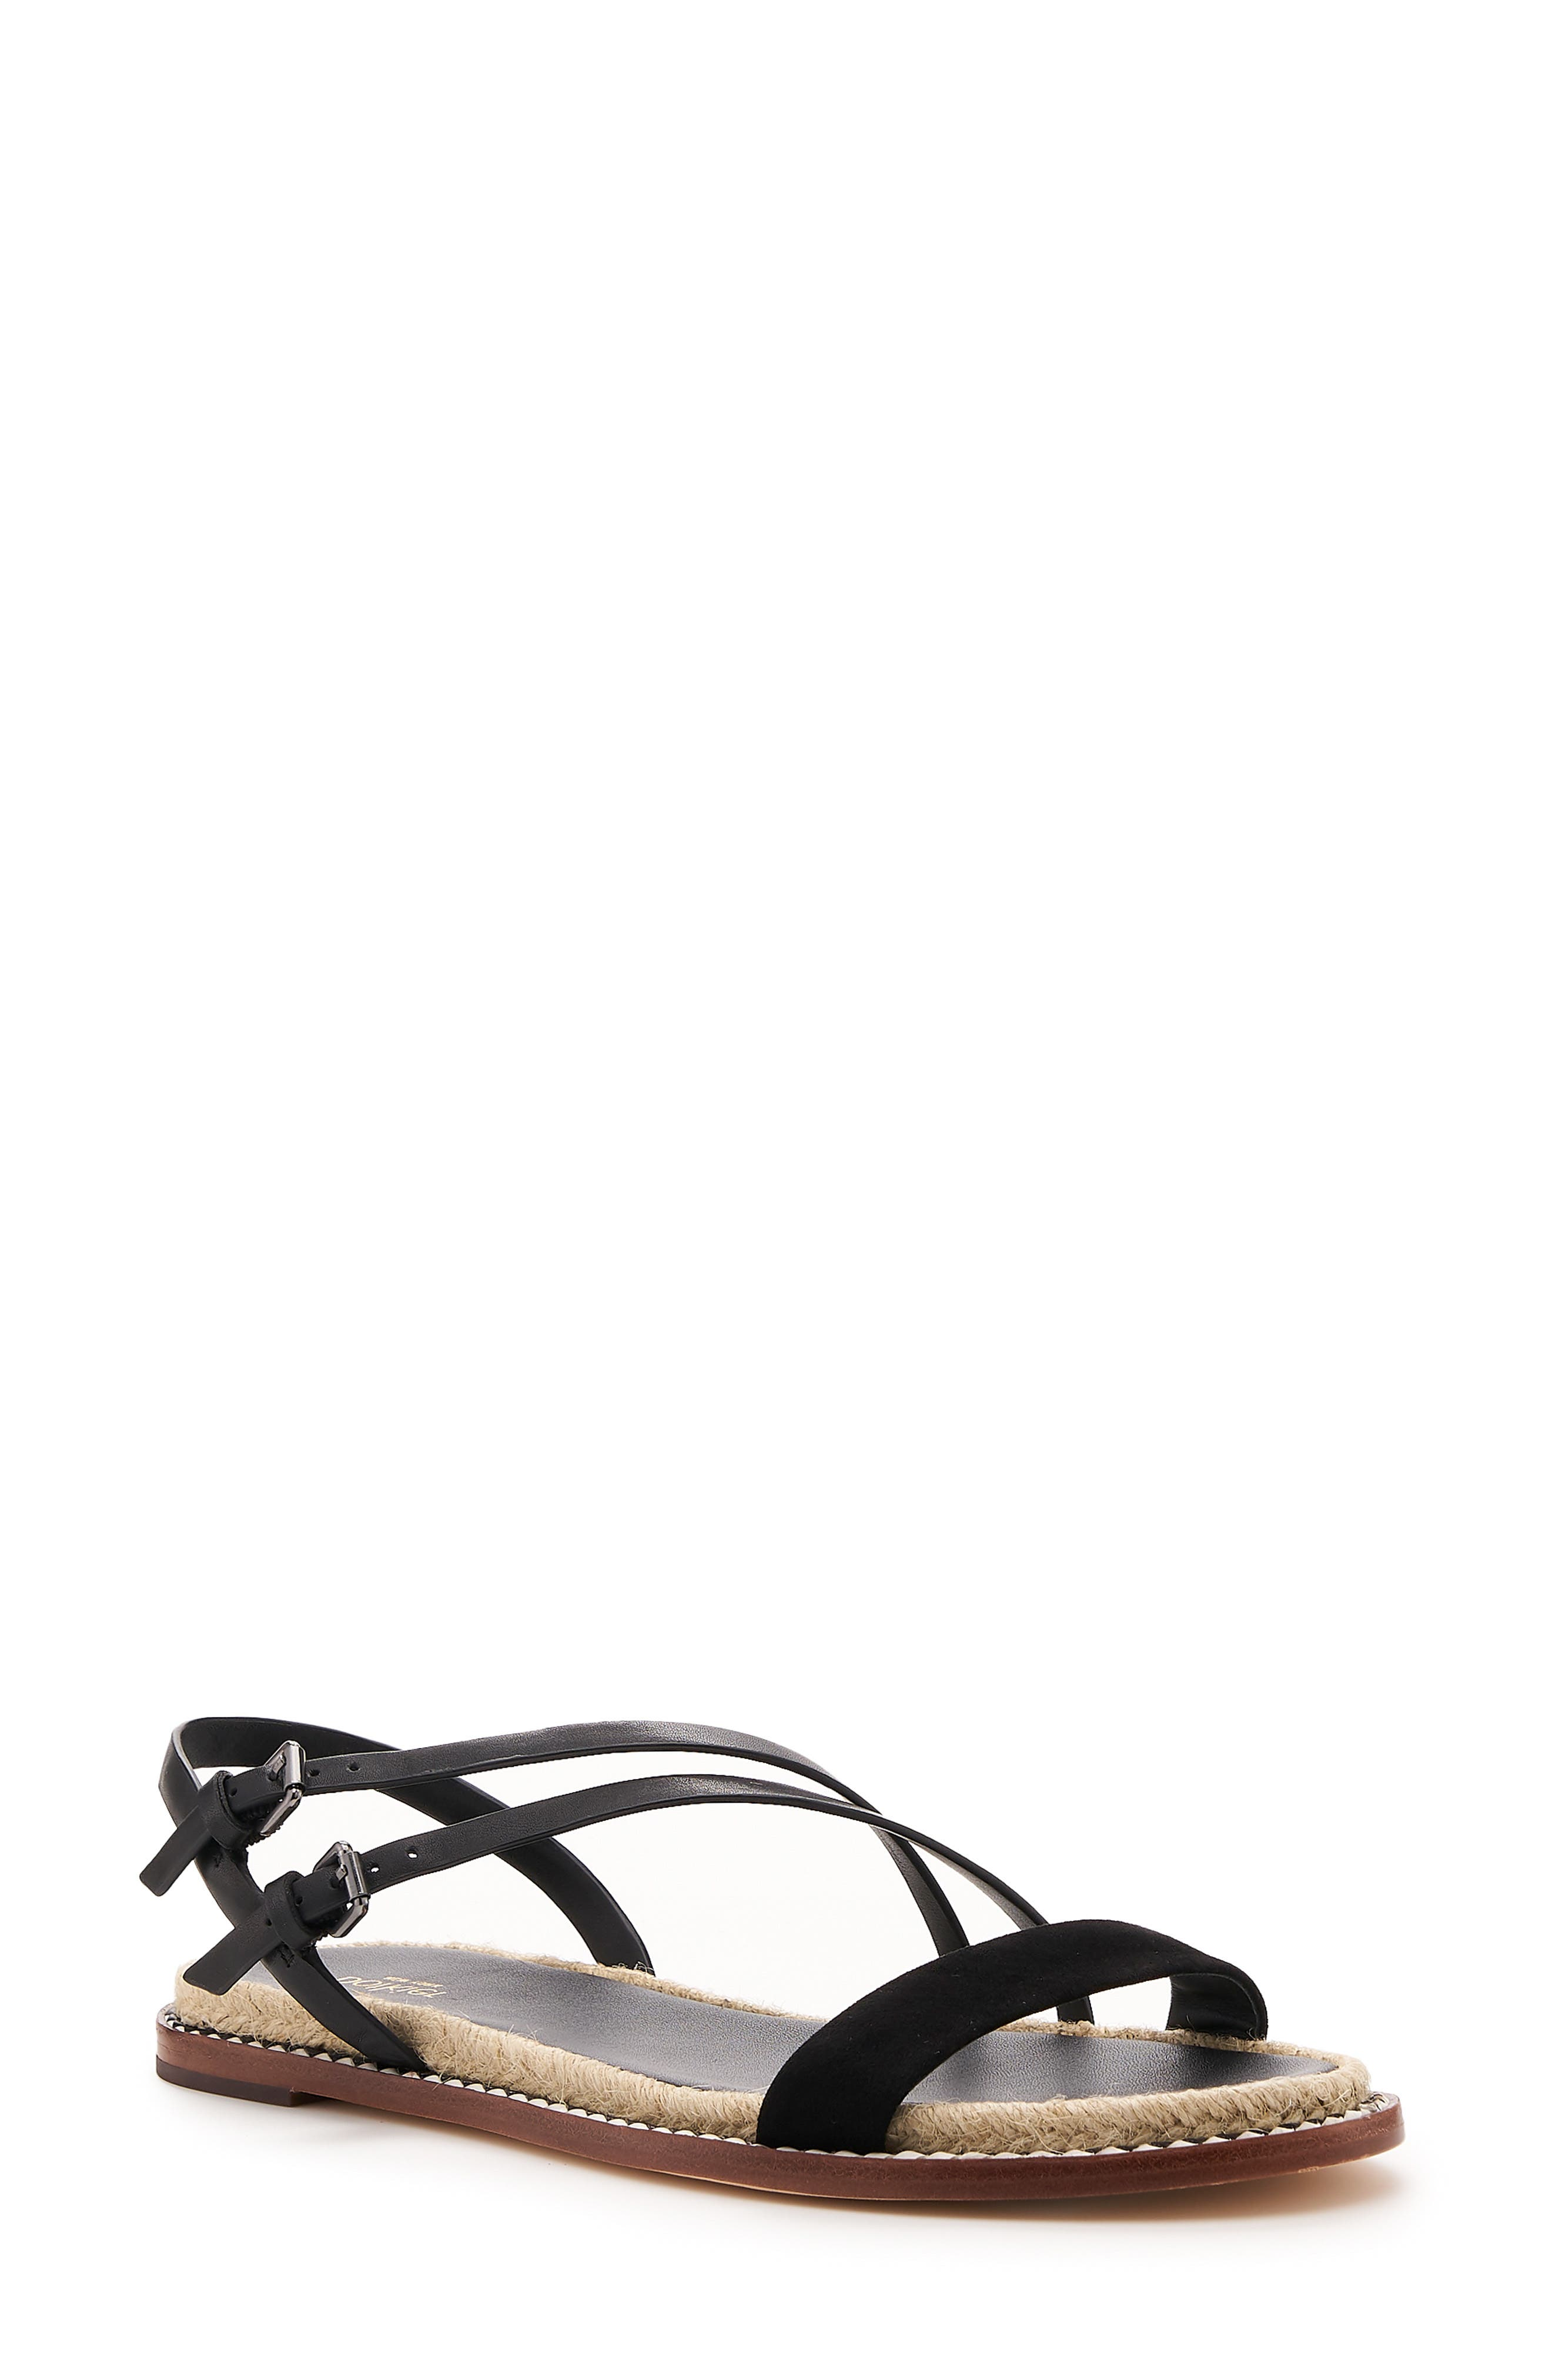 Botkier Island Sandal- Black